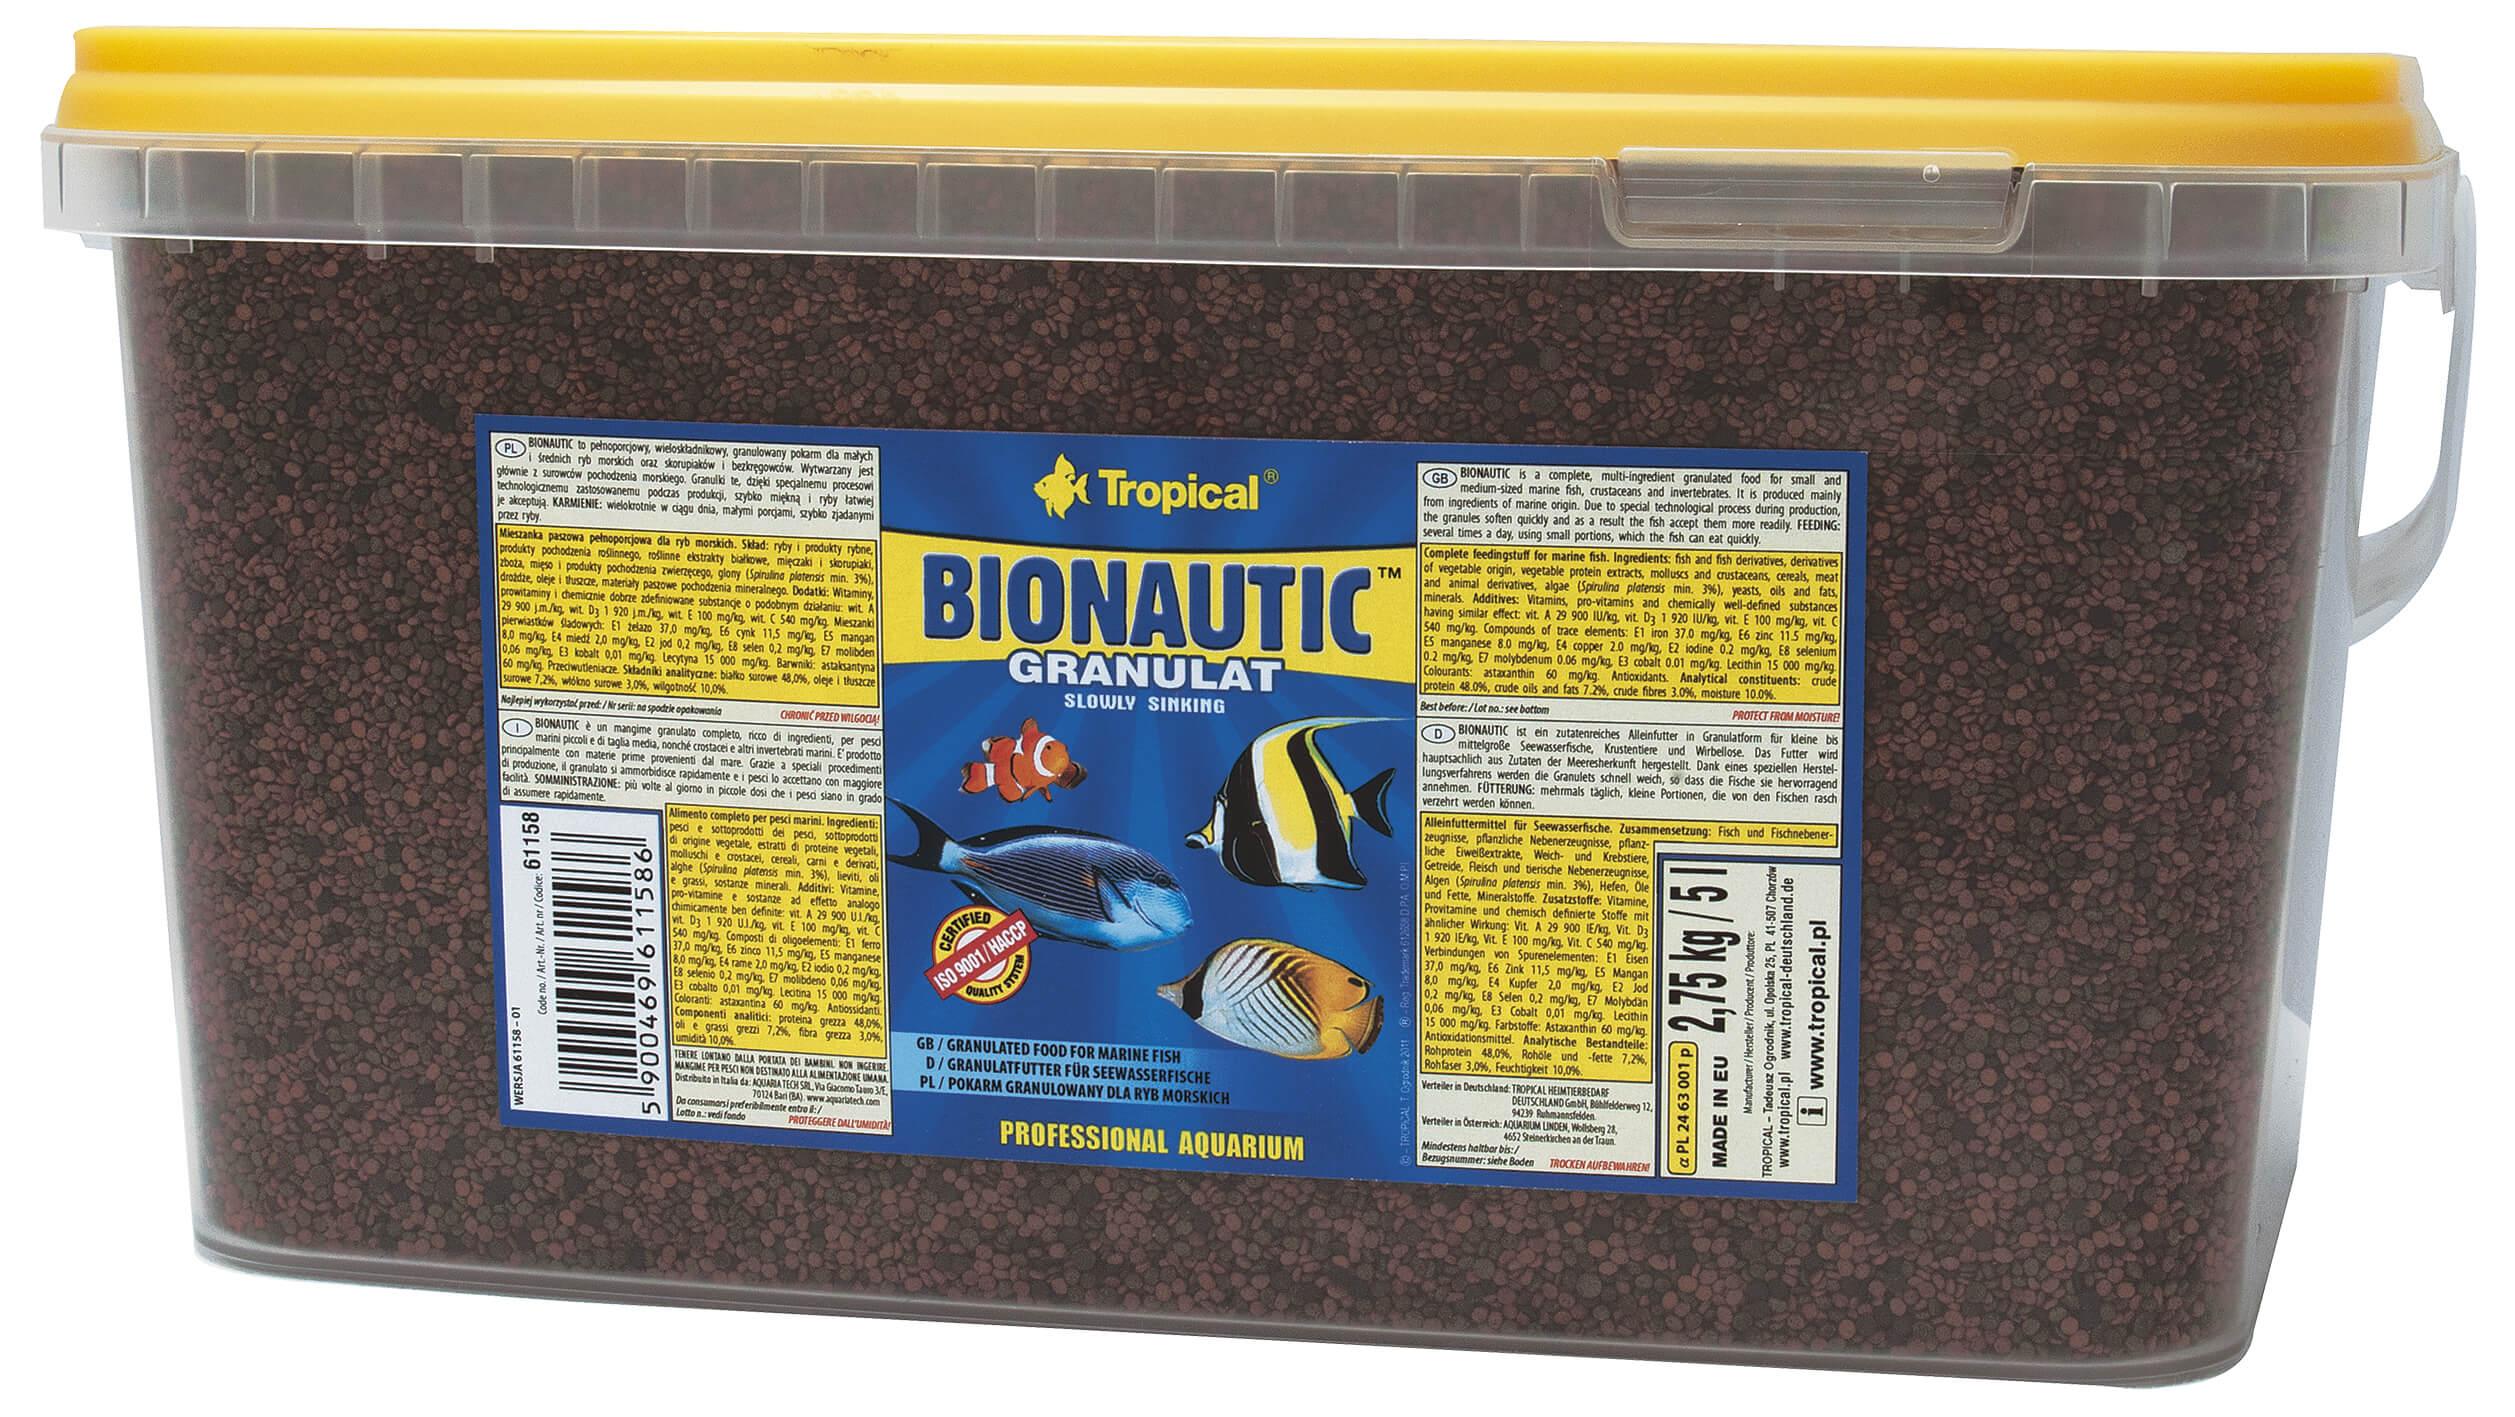 Tropical-Futter Bionautic Granulat 5 Ltr. / 2.75 Kg